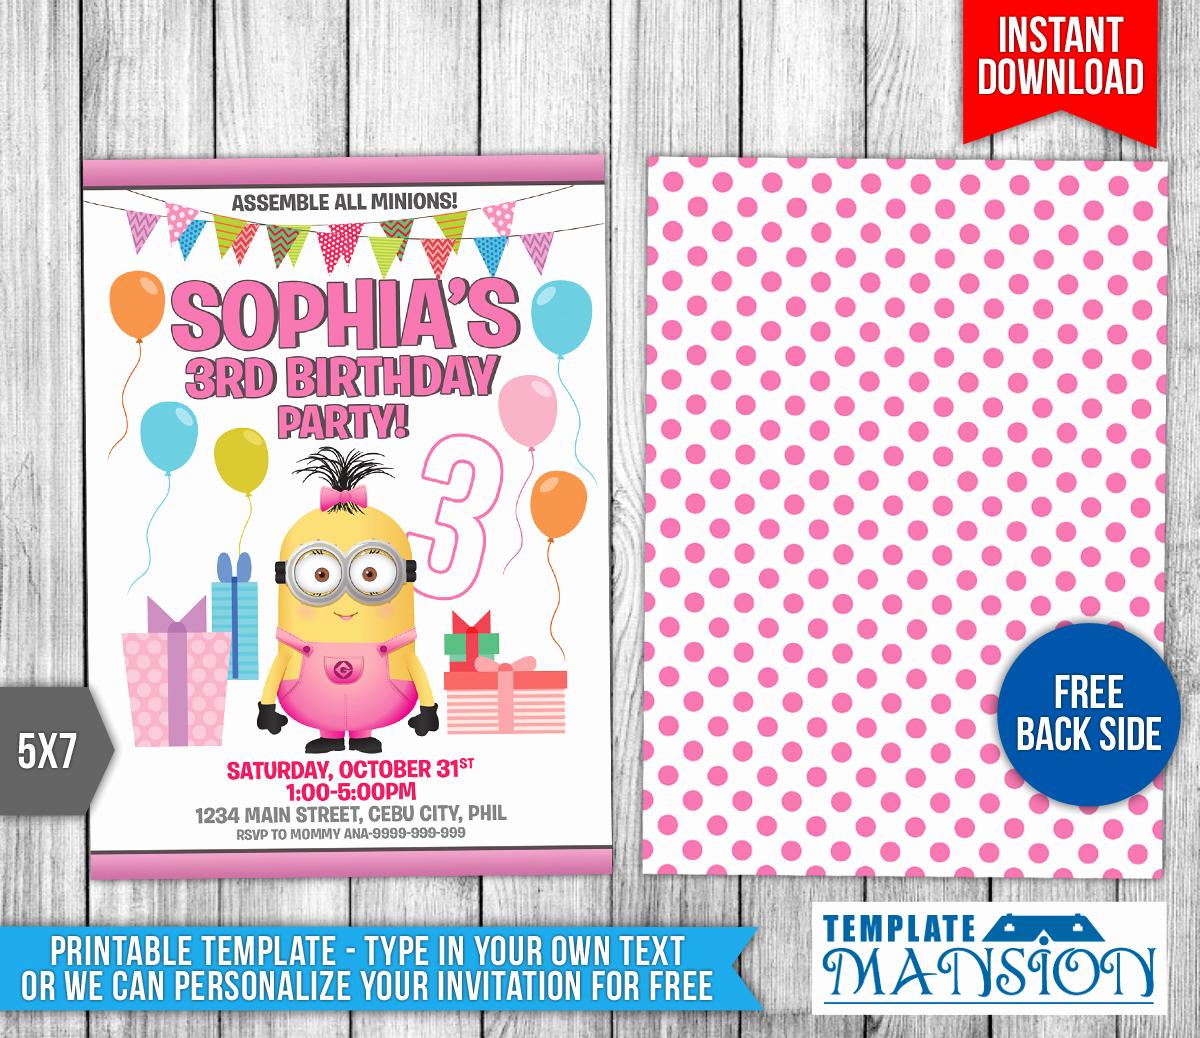 Free Minion Invitation Templates New Girl Minion Birthday Invitation Template 10 by